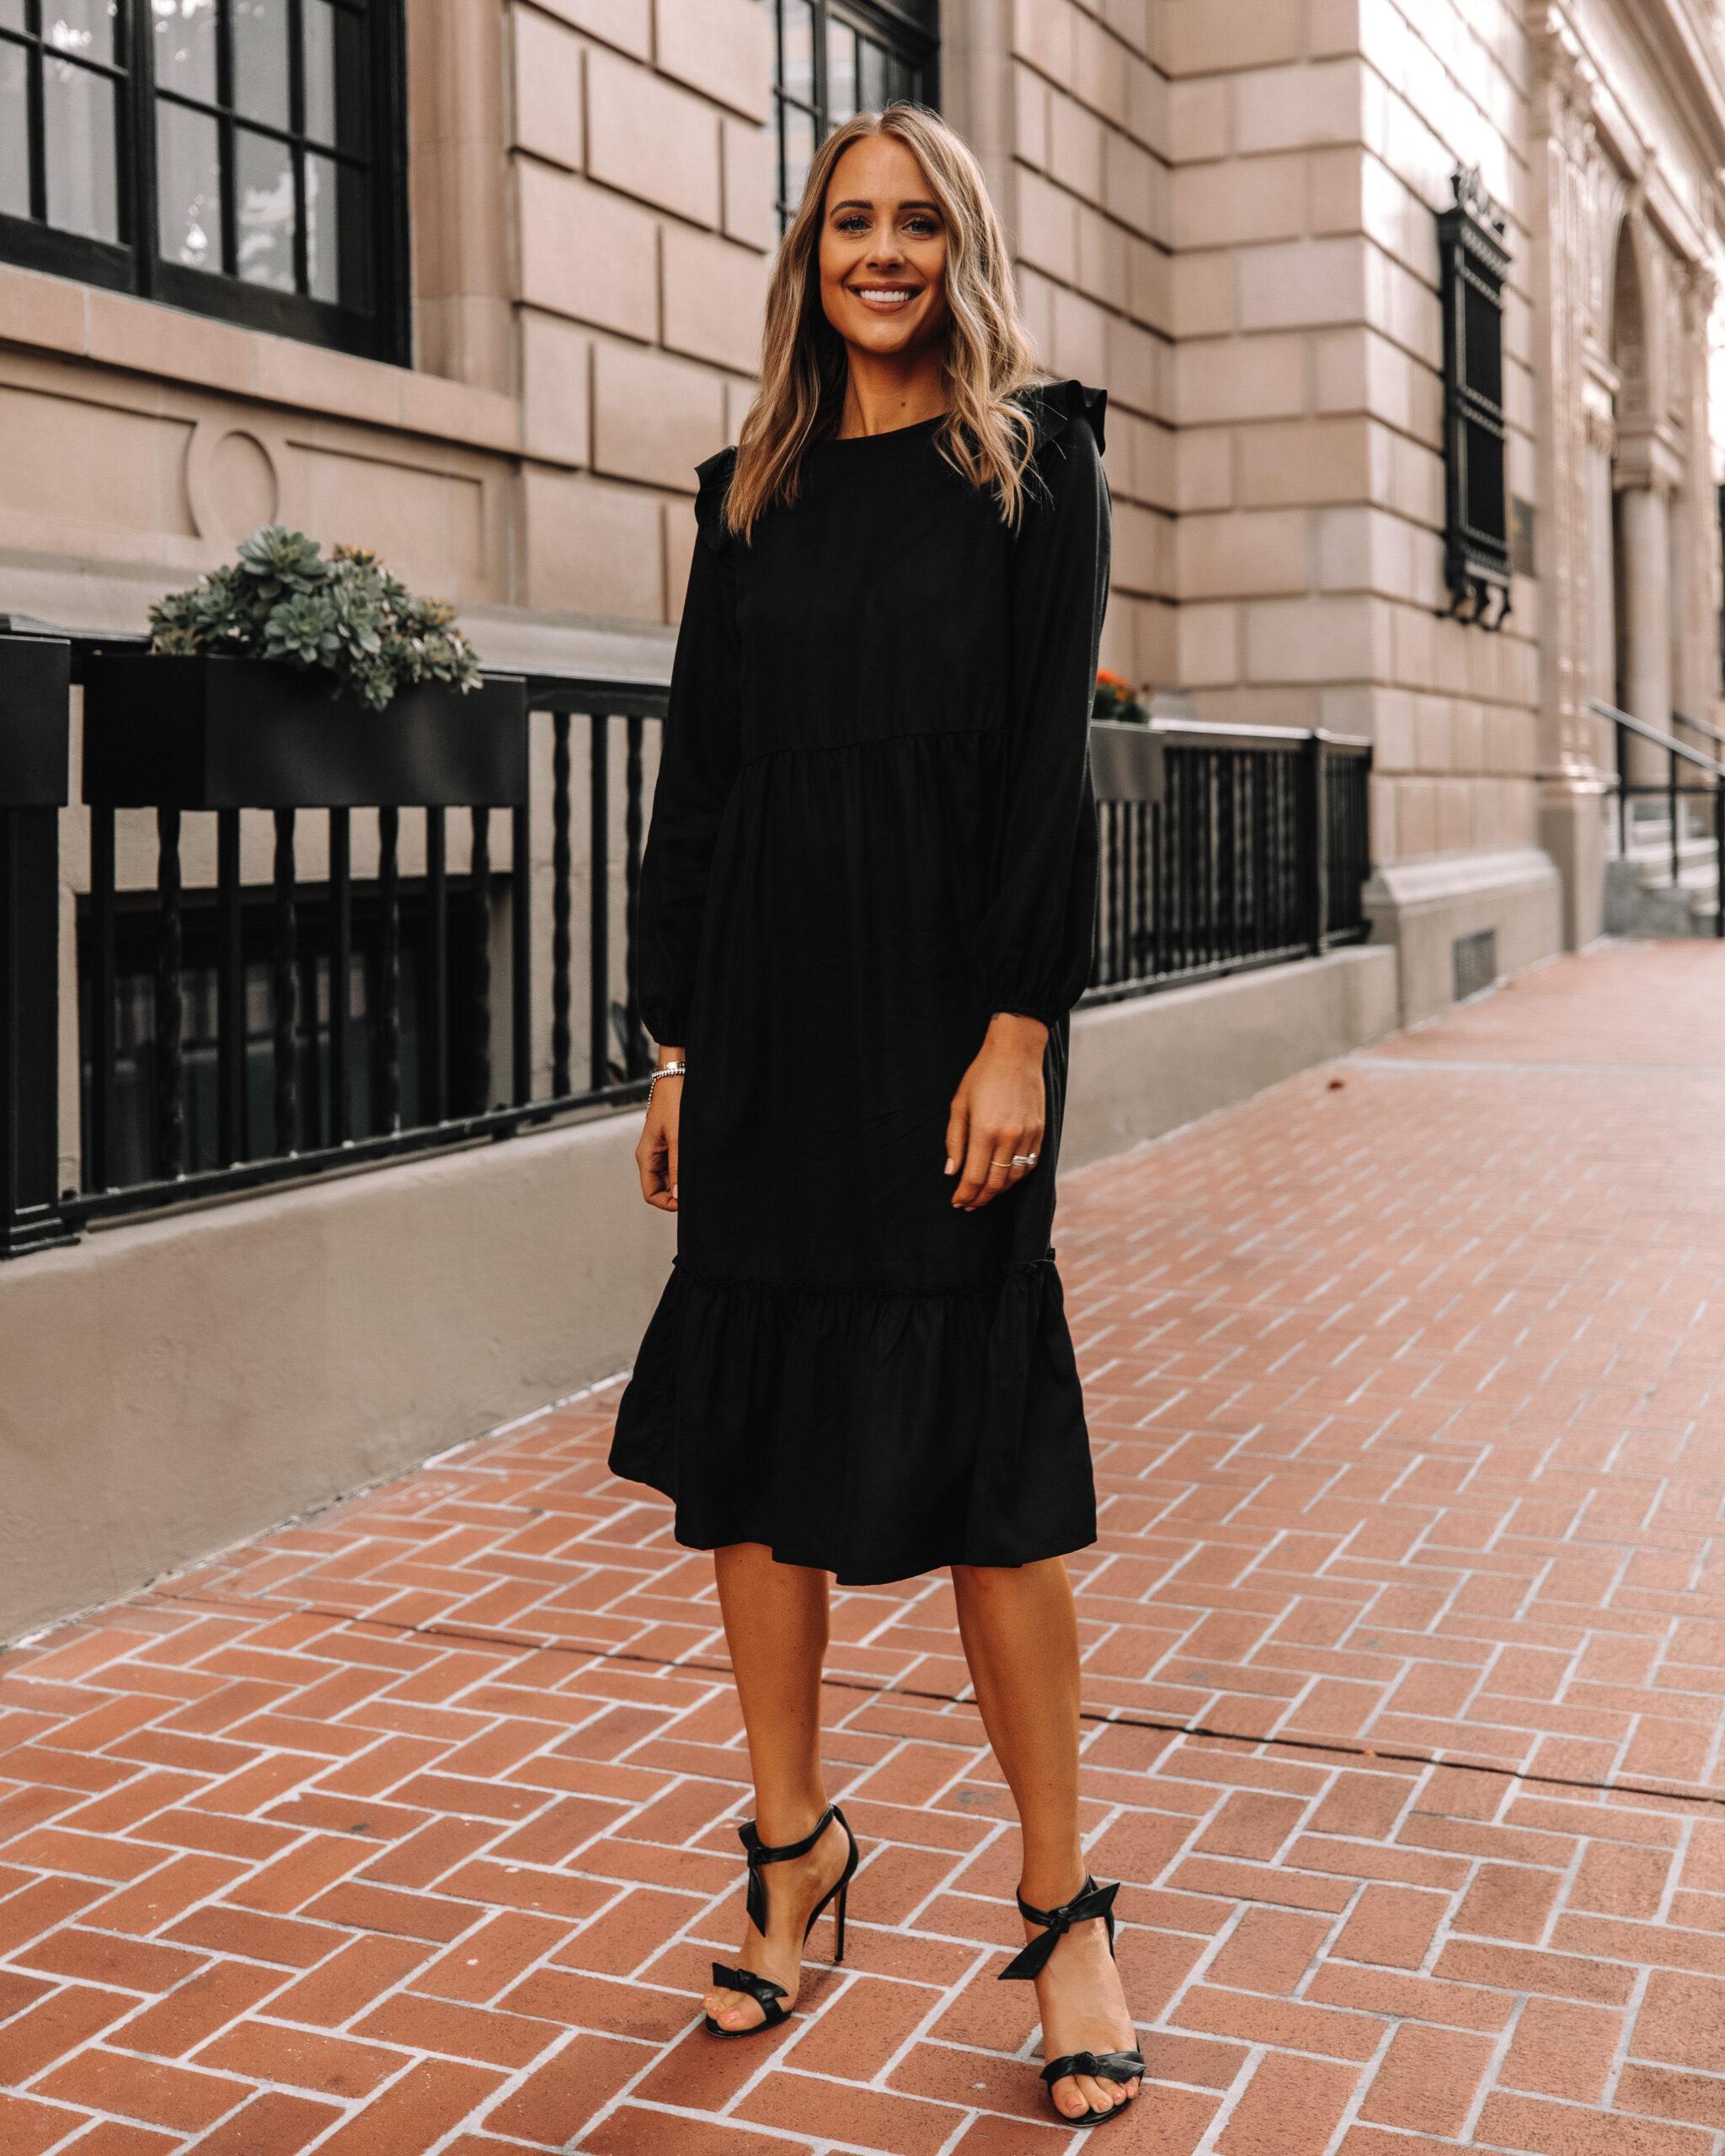 Fashion Jackson Wearing Amazon The Drop Black Midi Dress Black Heeled Sandals